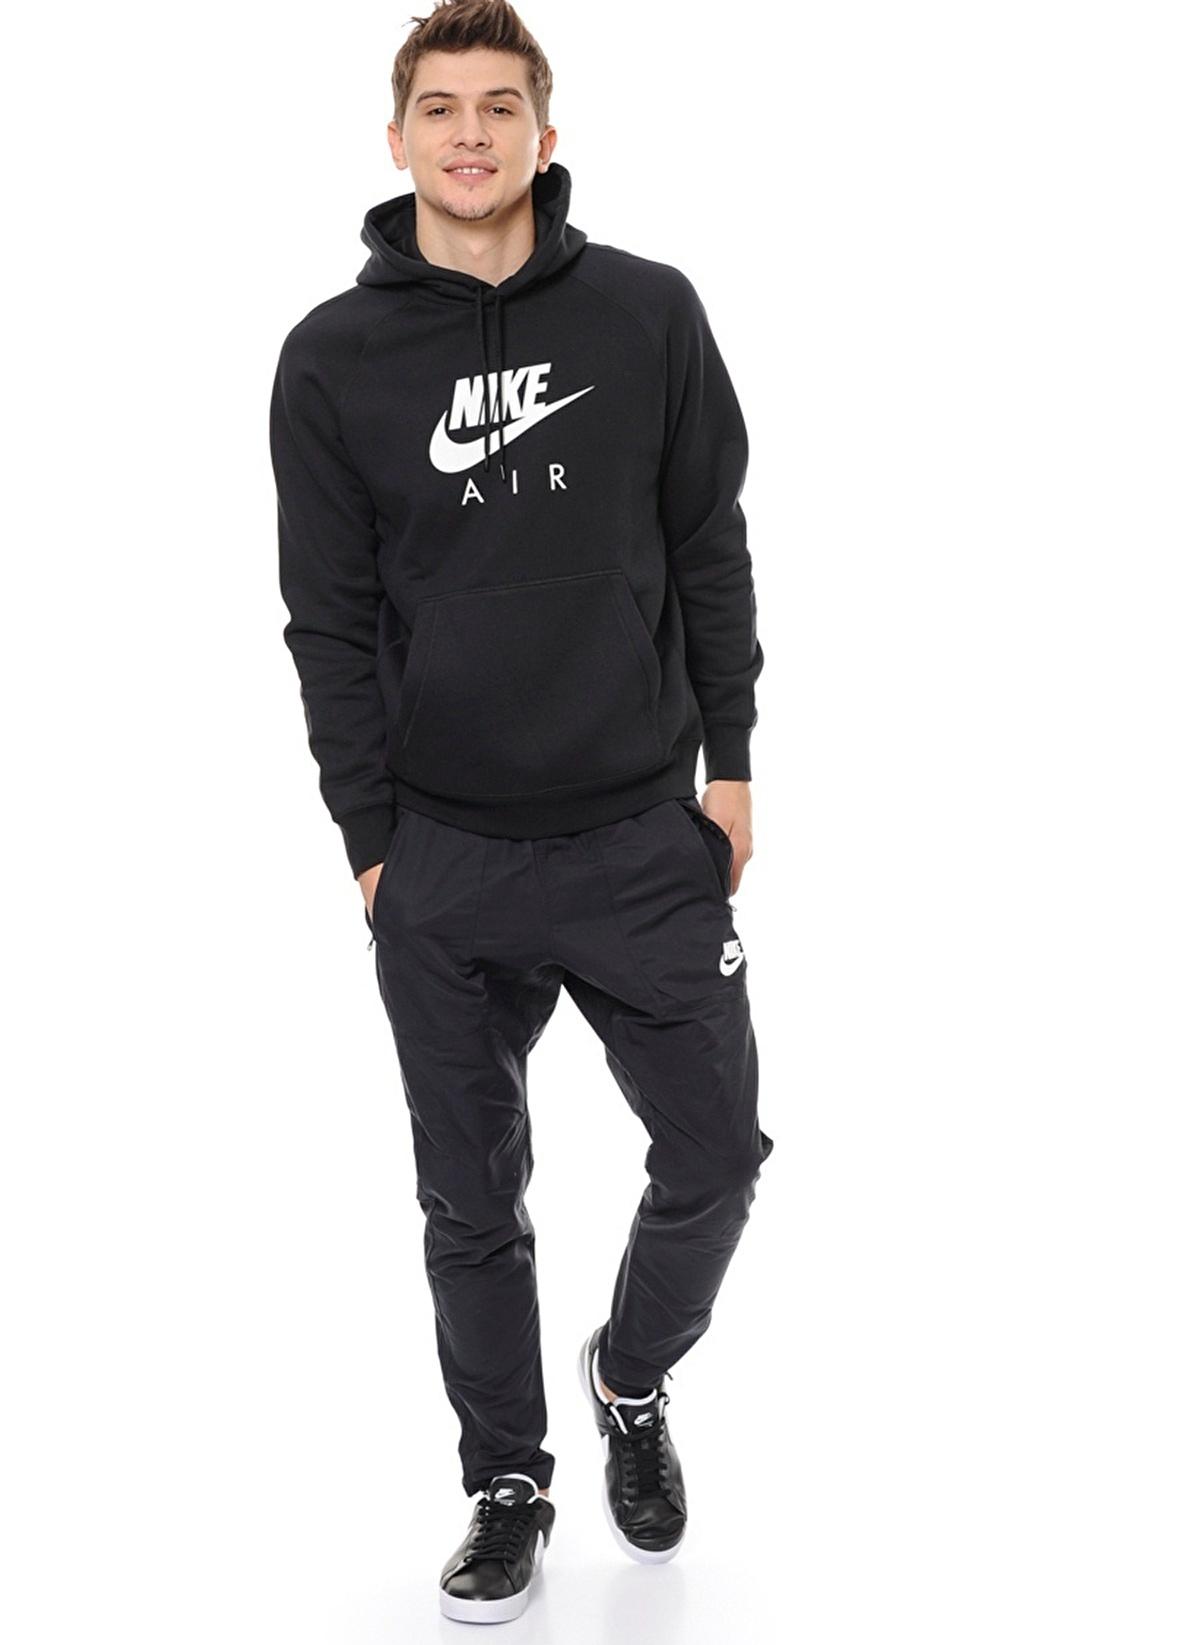 Erkek Nike Nike Sweatshirt Sweatshirt BlackWhiteMorhipo17507316 Sweatshirt Sweatshirt BlackWhiteMorhipo17507316 Erkek Erkek BlackWhiteMorhipo17507316 Erkek Nike Nike FJ3lKT1c